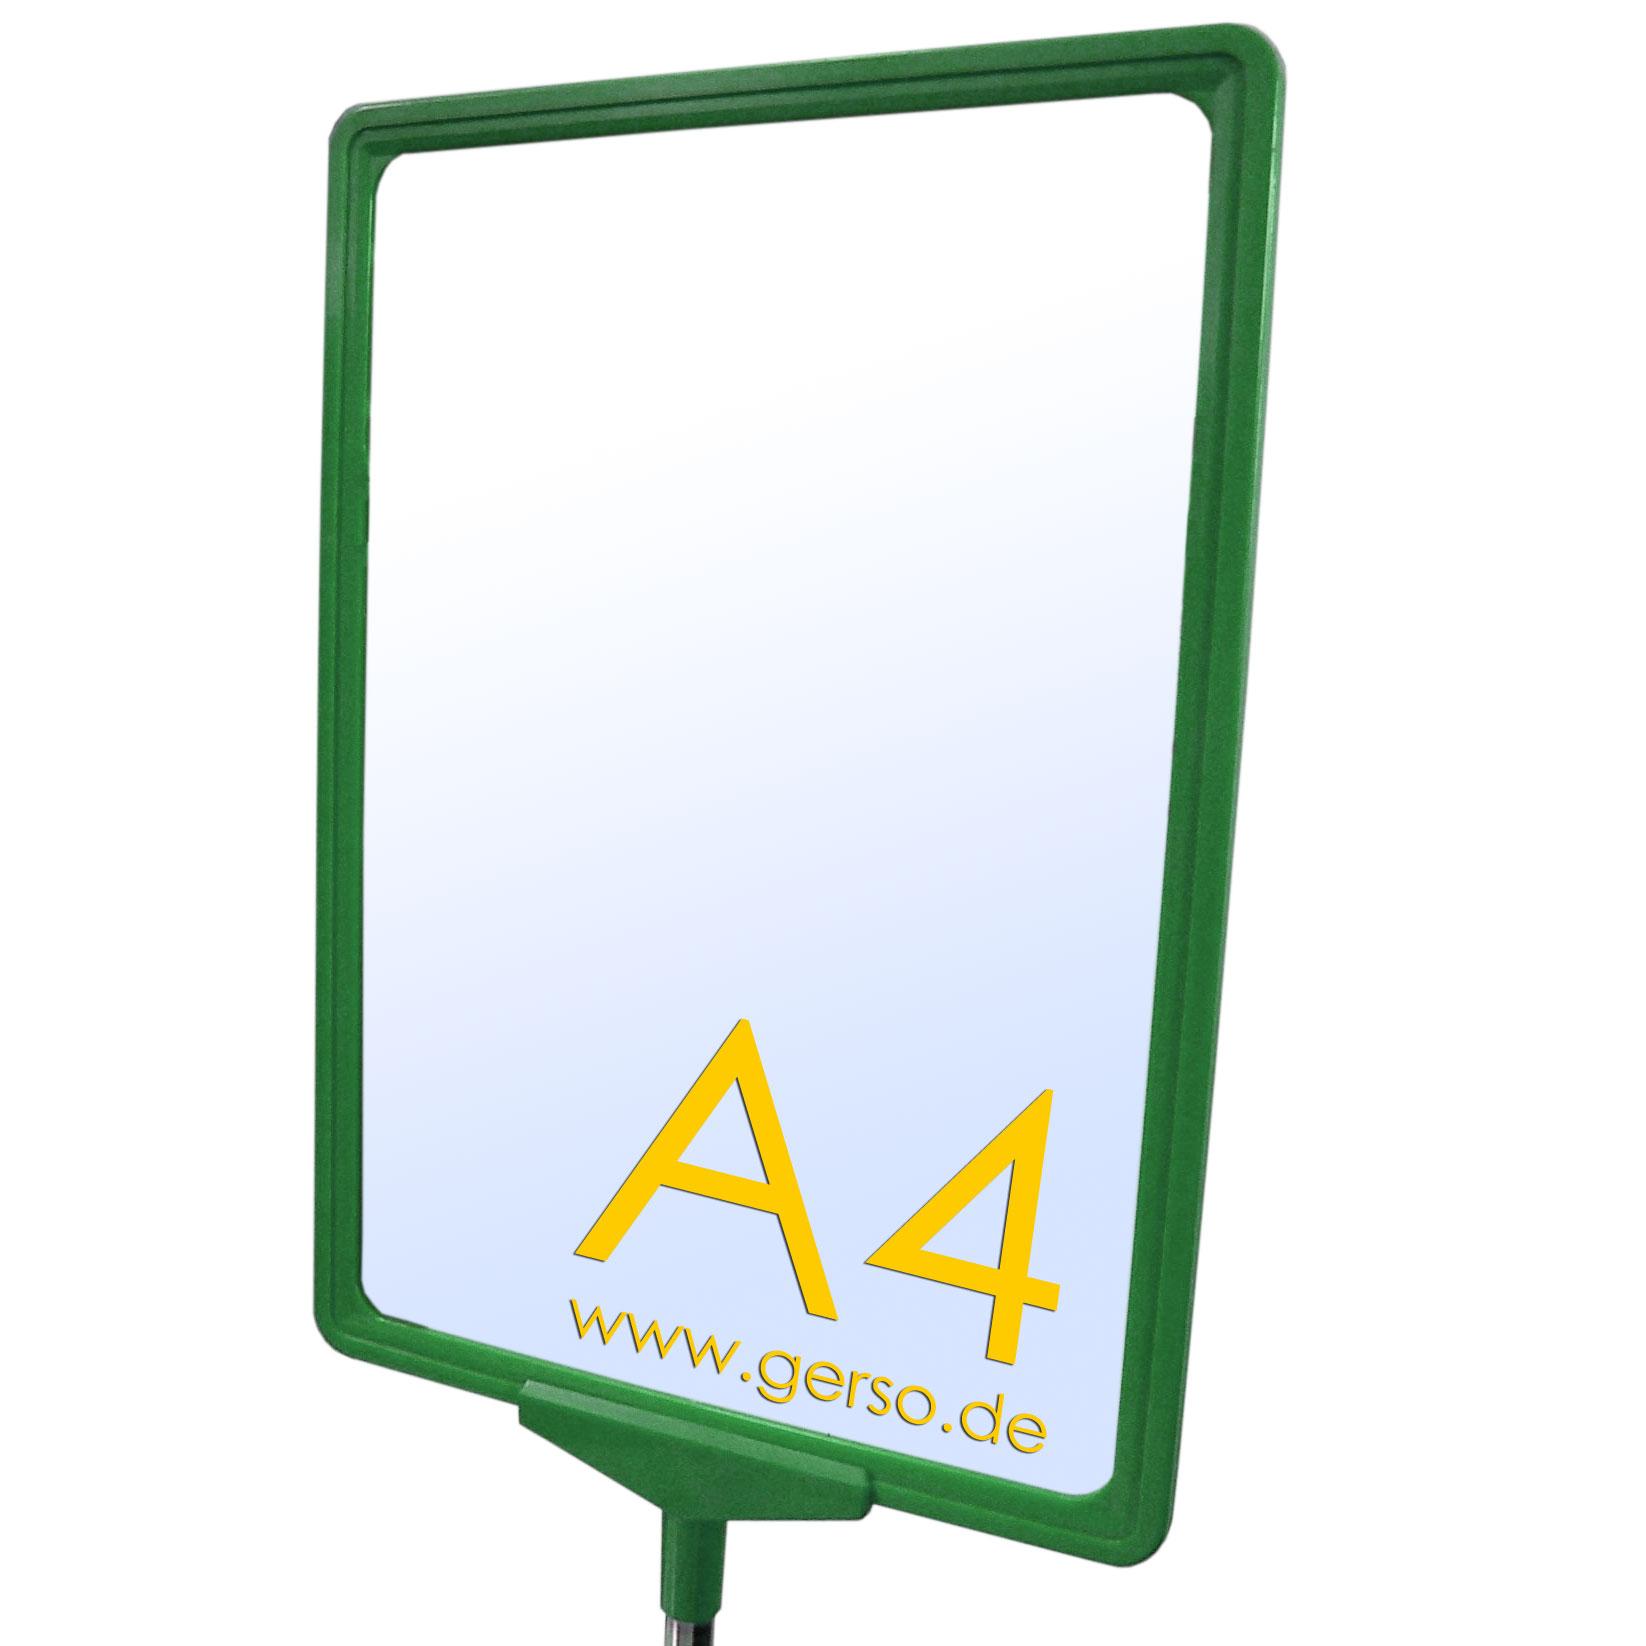 Plakatrahmen im Format A4 Farbe: grün